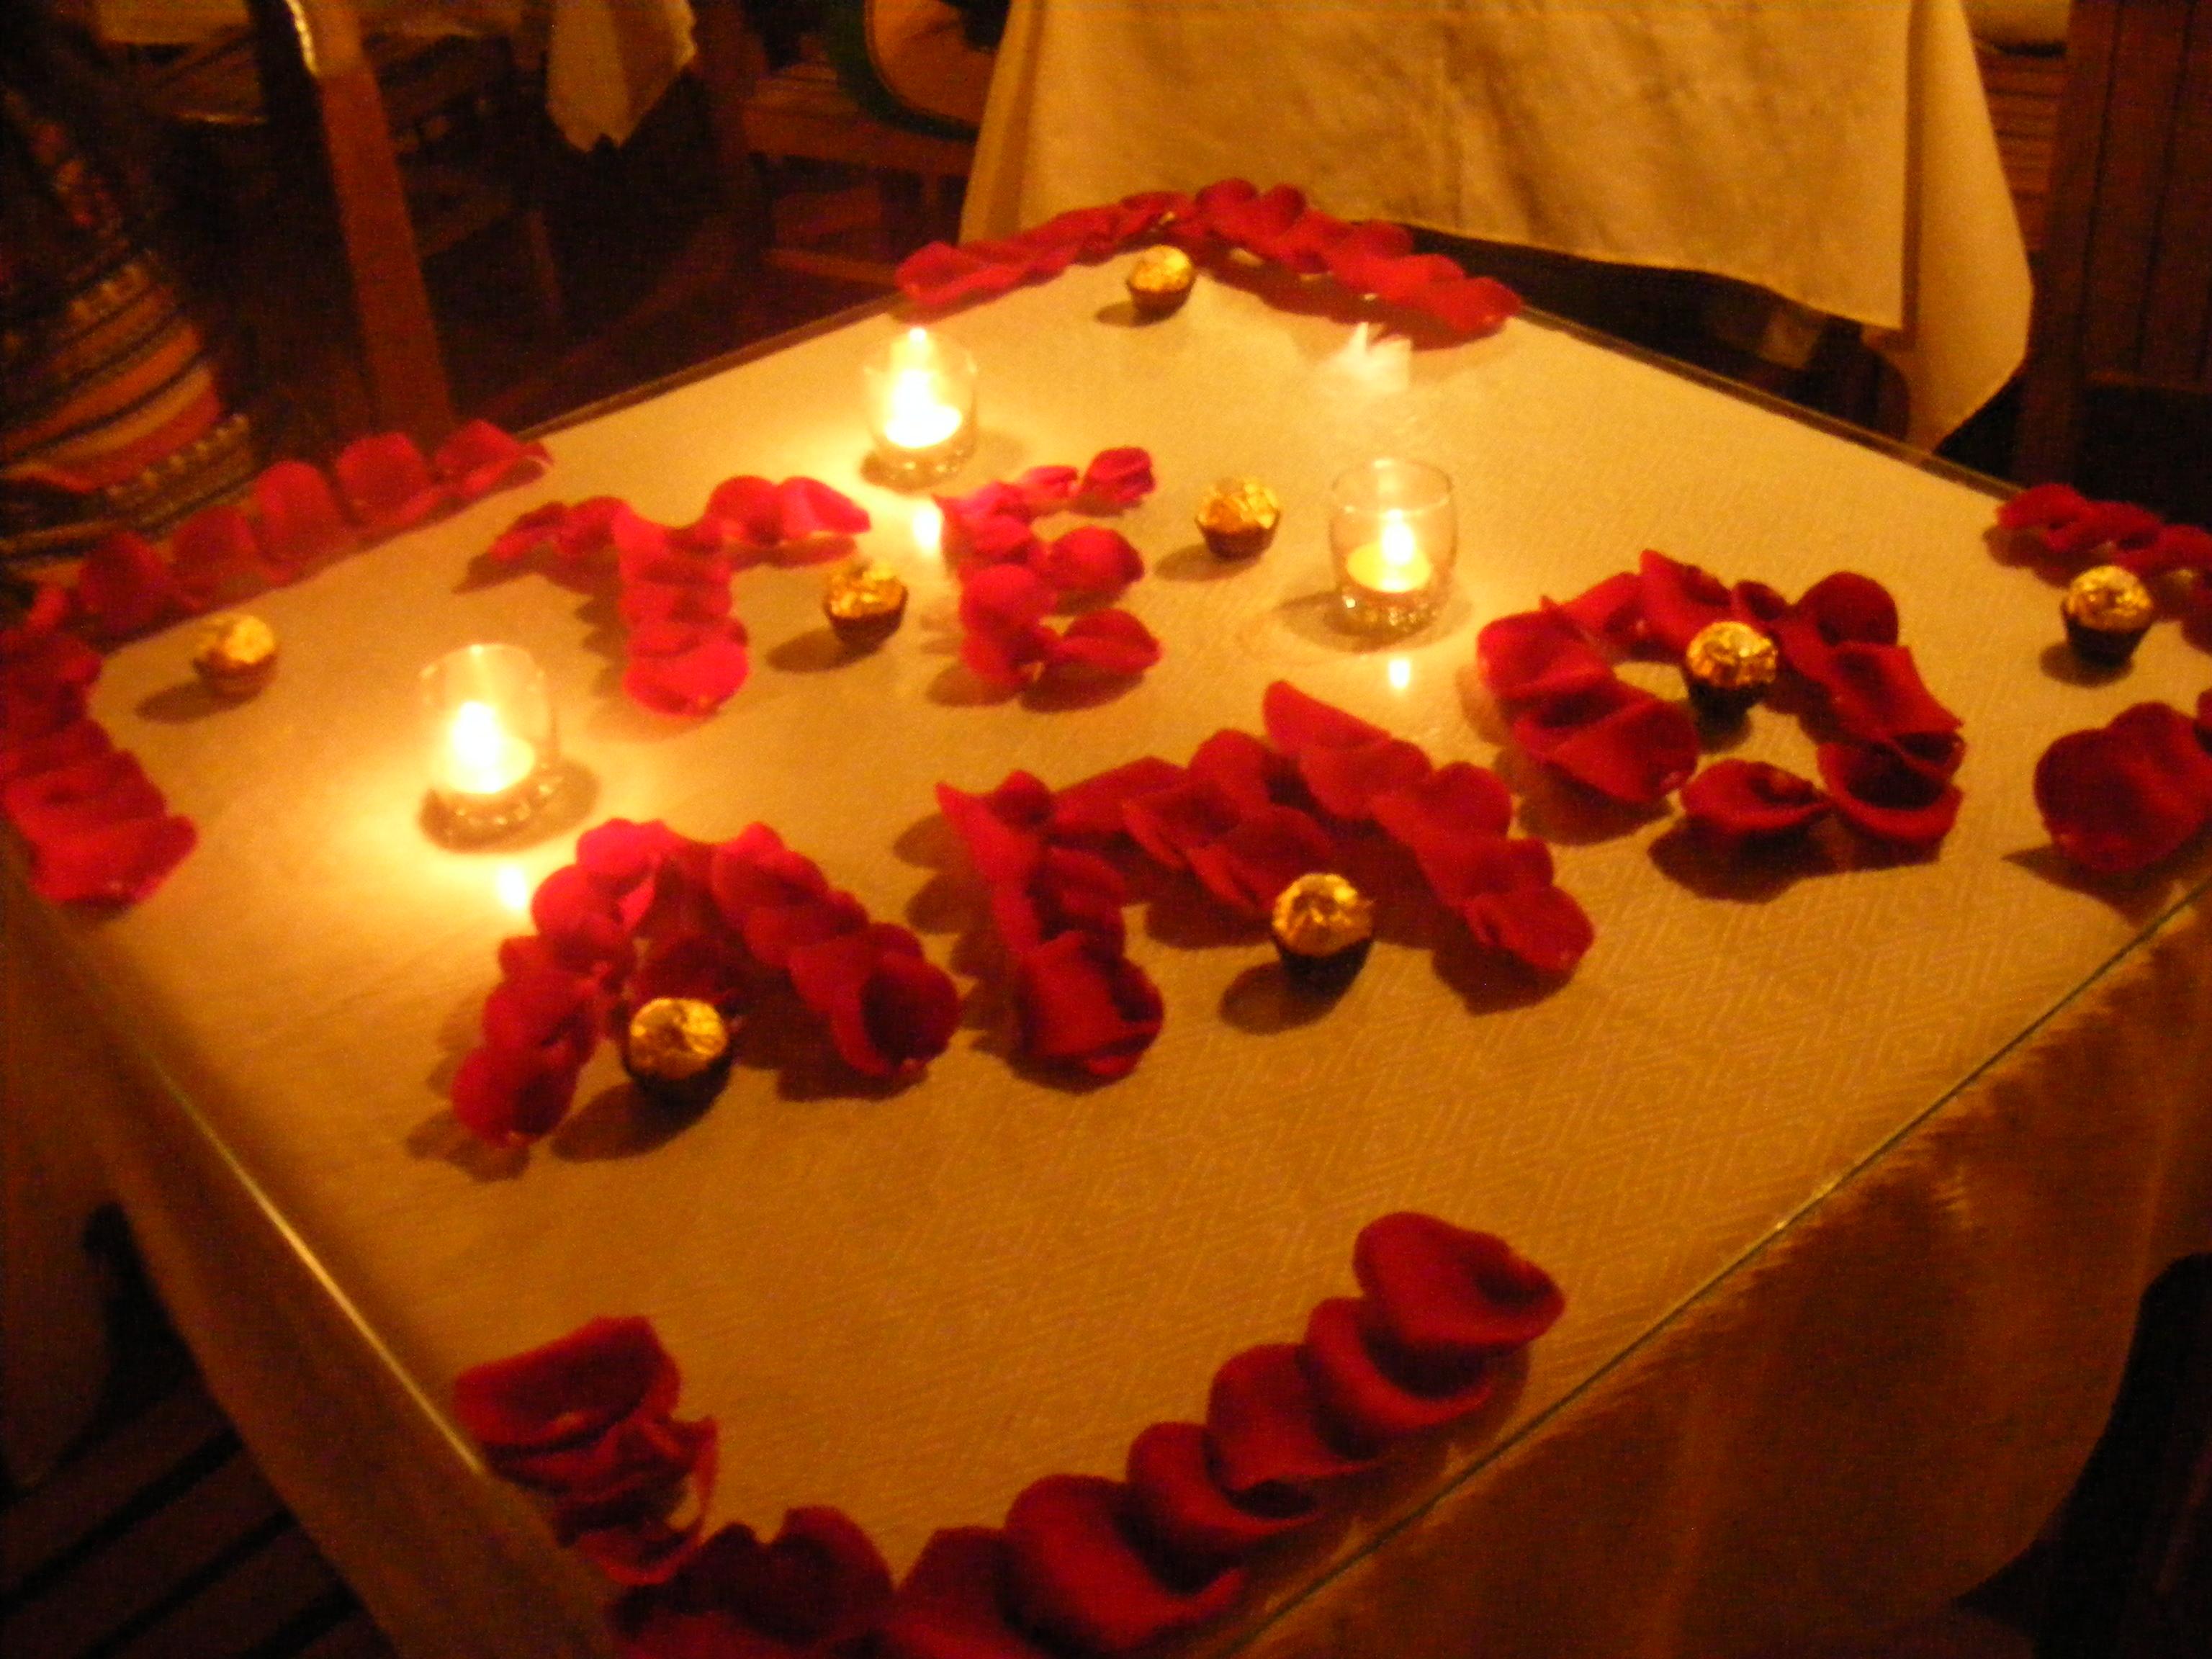 Cena romantica rekaditos - Detalles para cena romantica ...